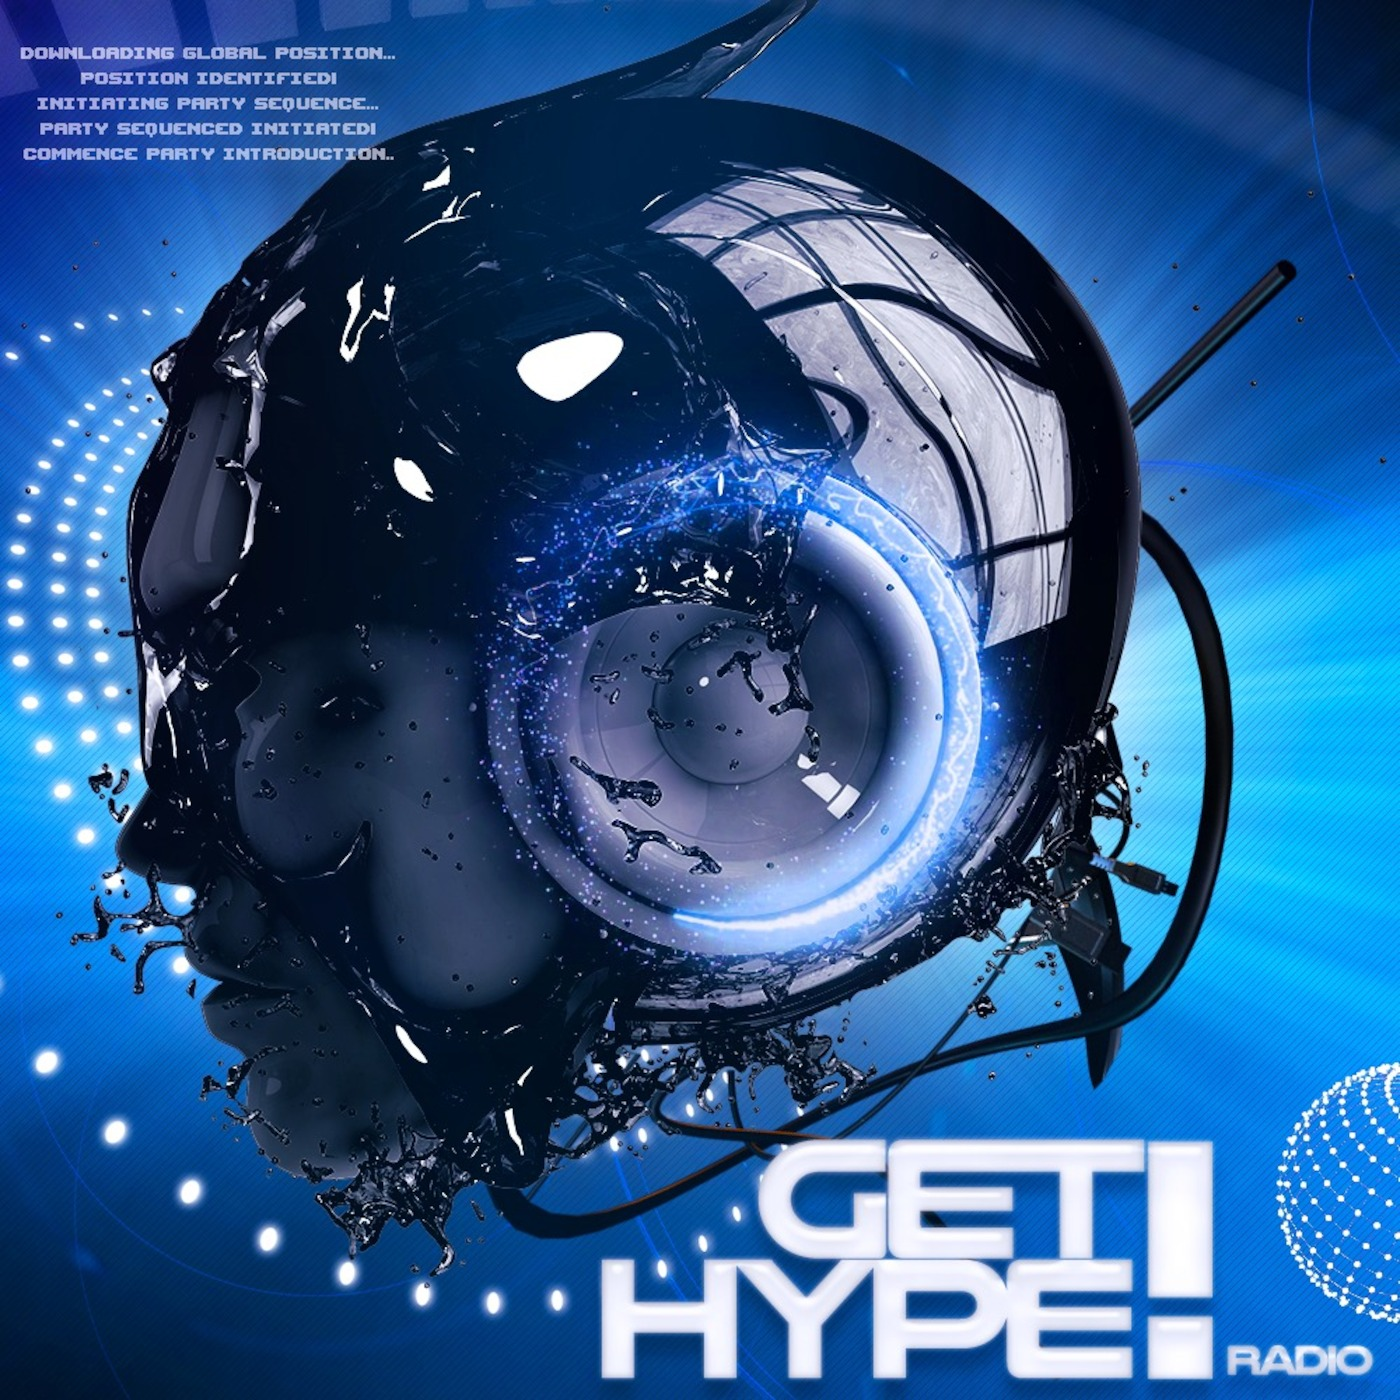 Get Hype! Radio